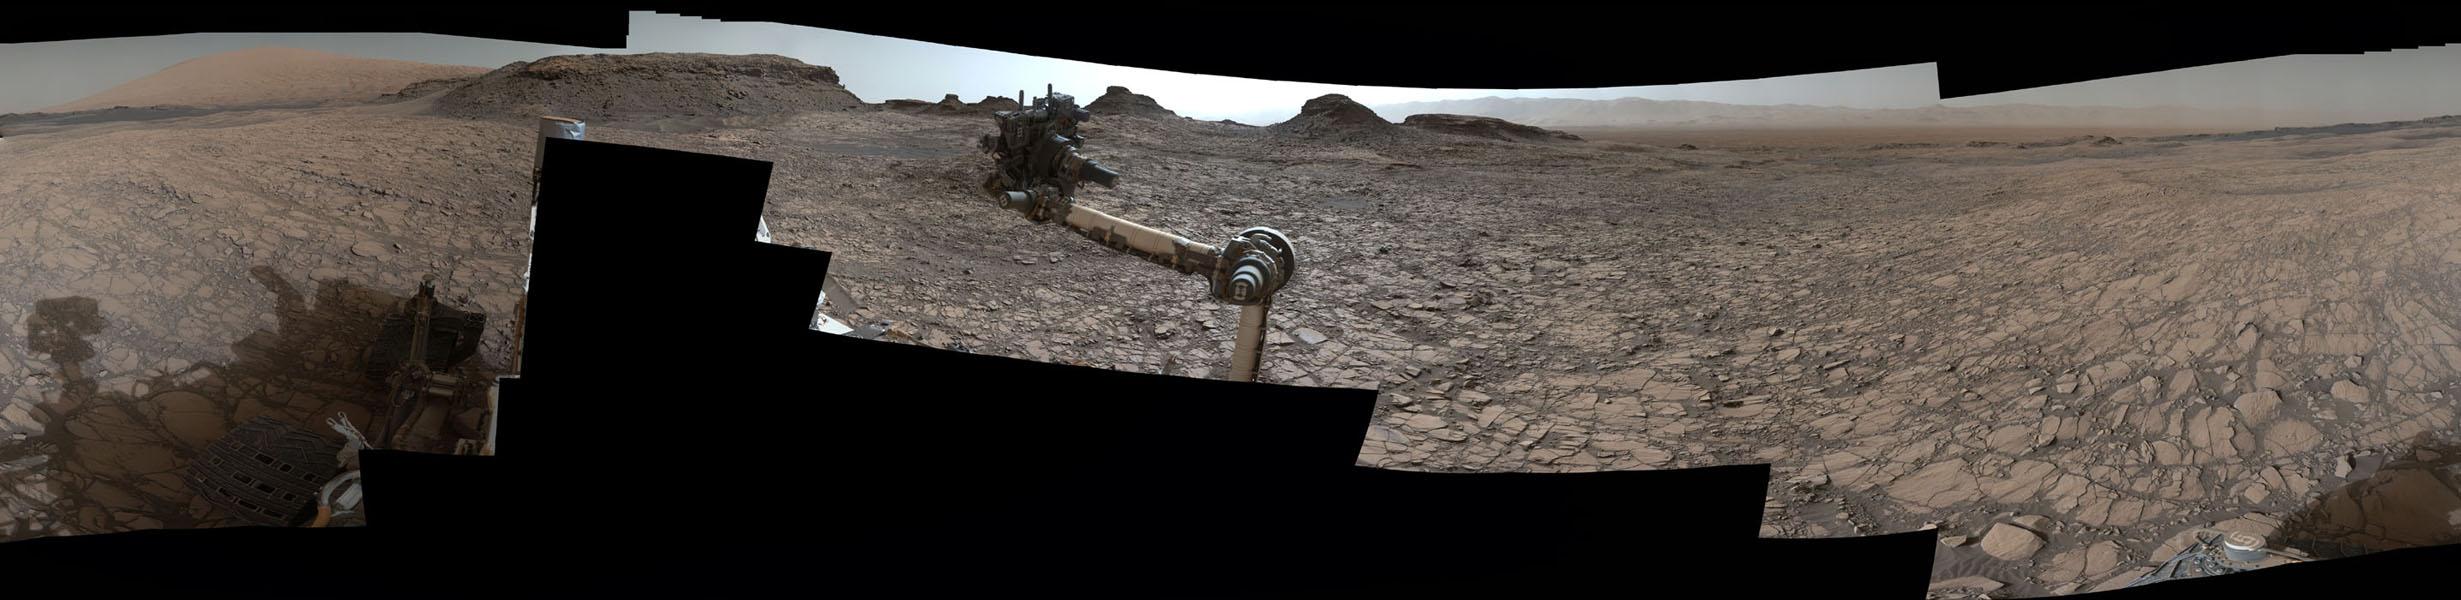 This Martian Landscape Looks Like the American Desert